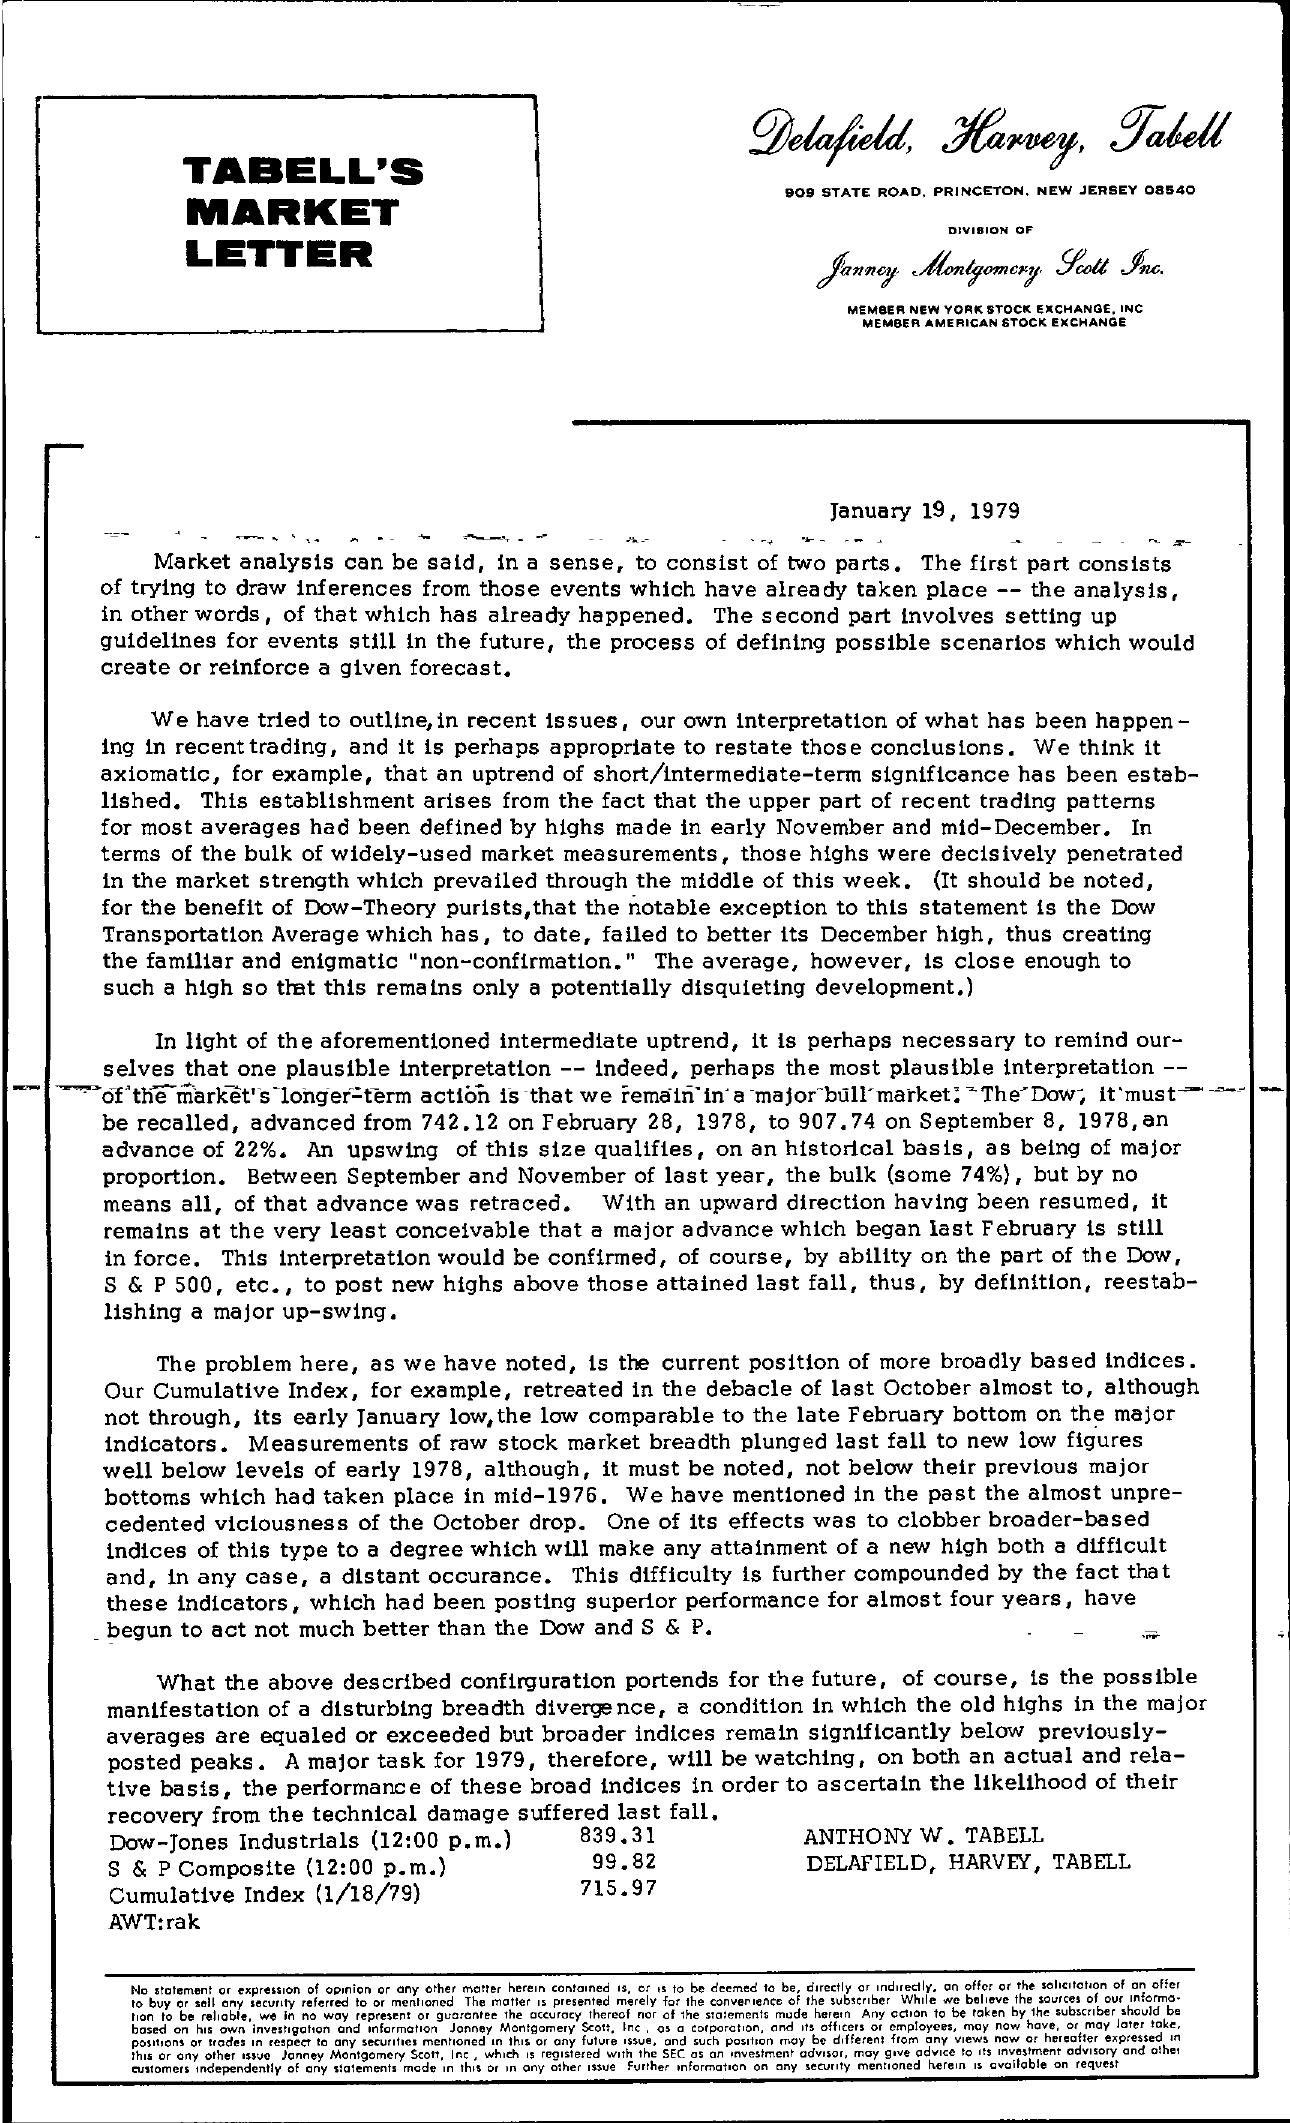 Tabell's Market Letter - January 19, 1979